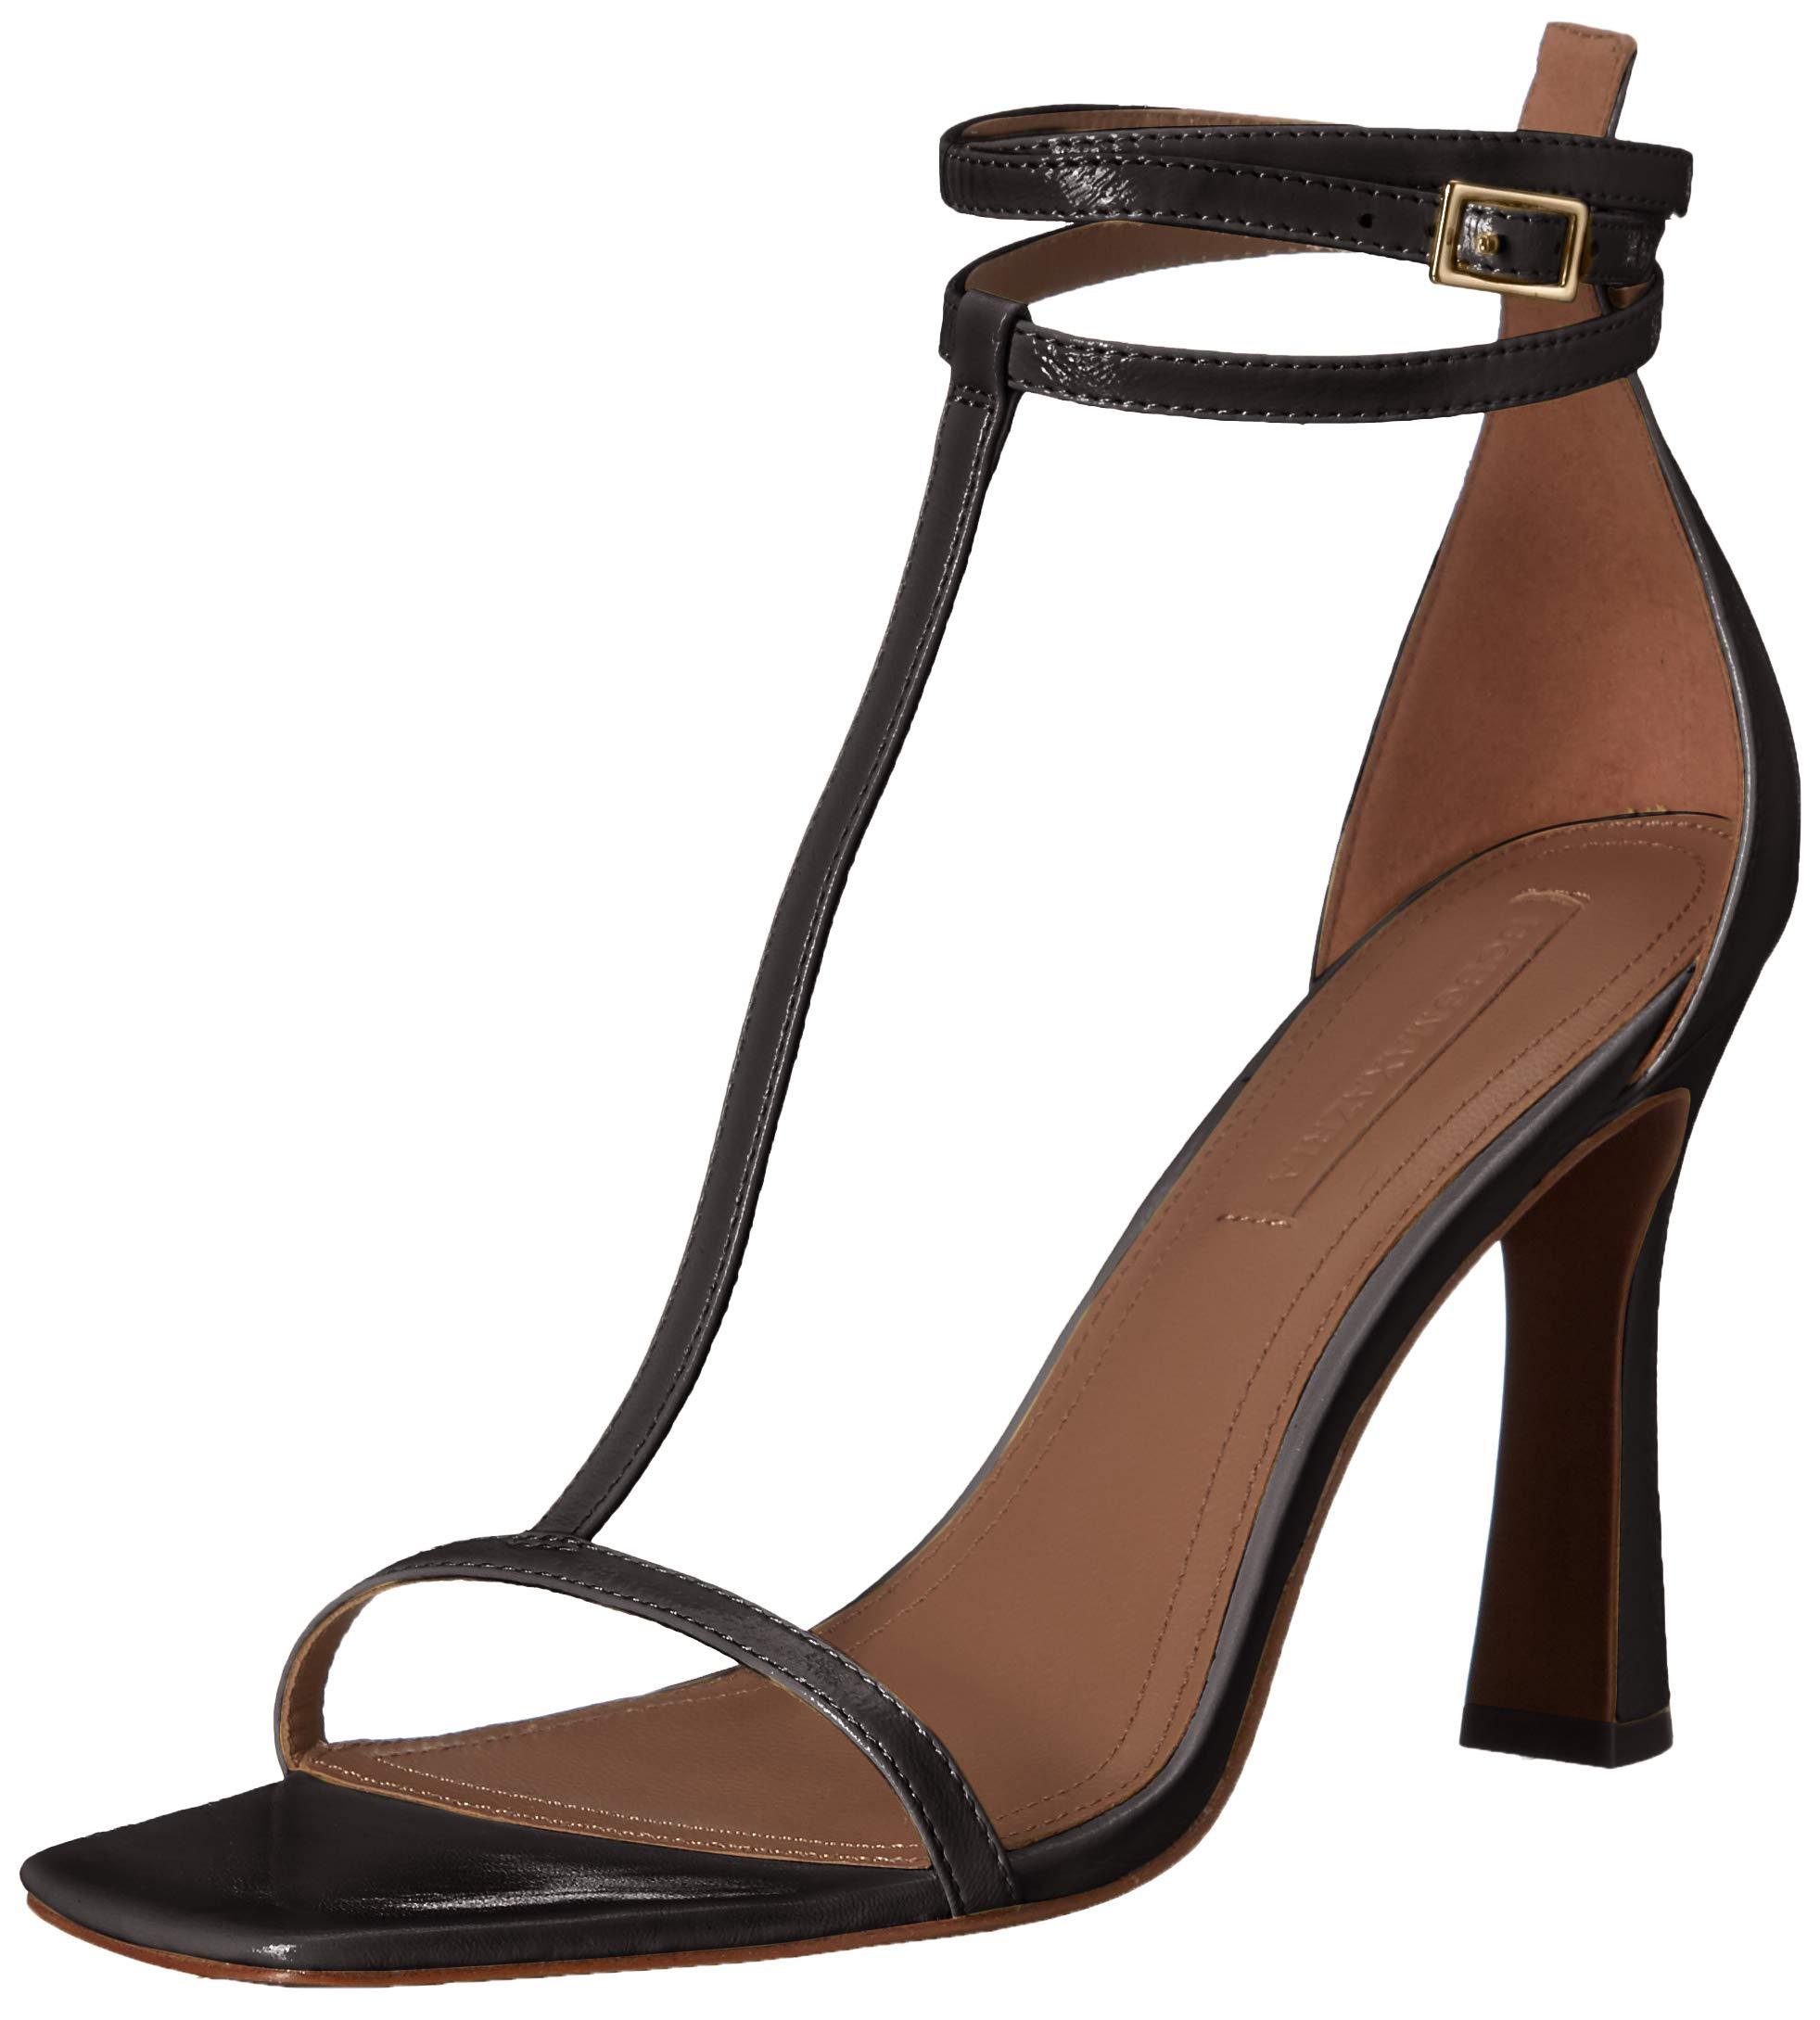 BCBGMAXAZRIA Women's Ina T-Strap Dress Sandal Sandal, Black, 6.5 M US by BCBGMAXAZRIA